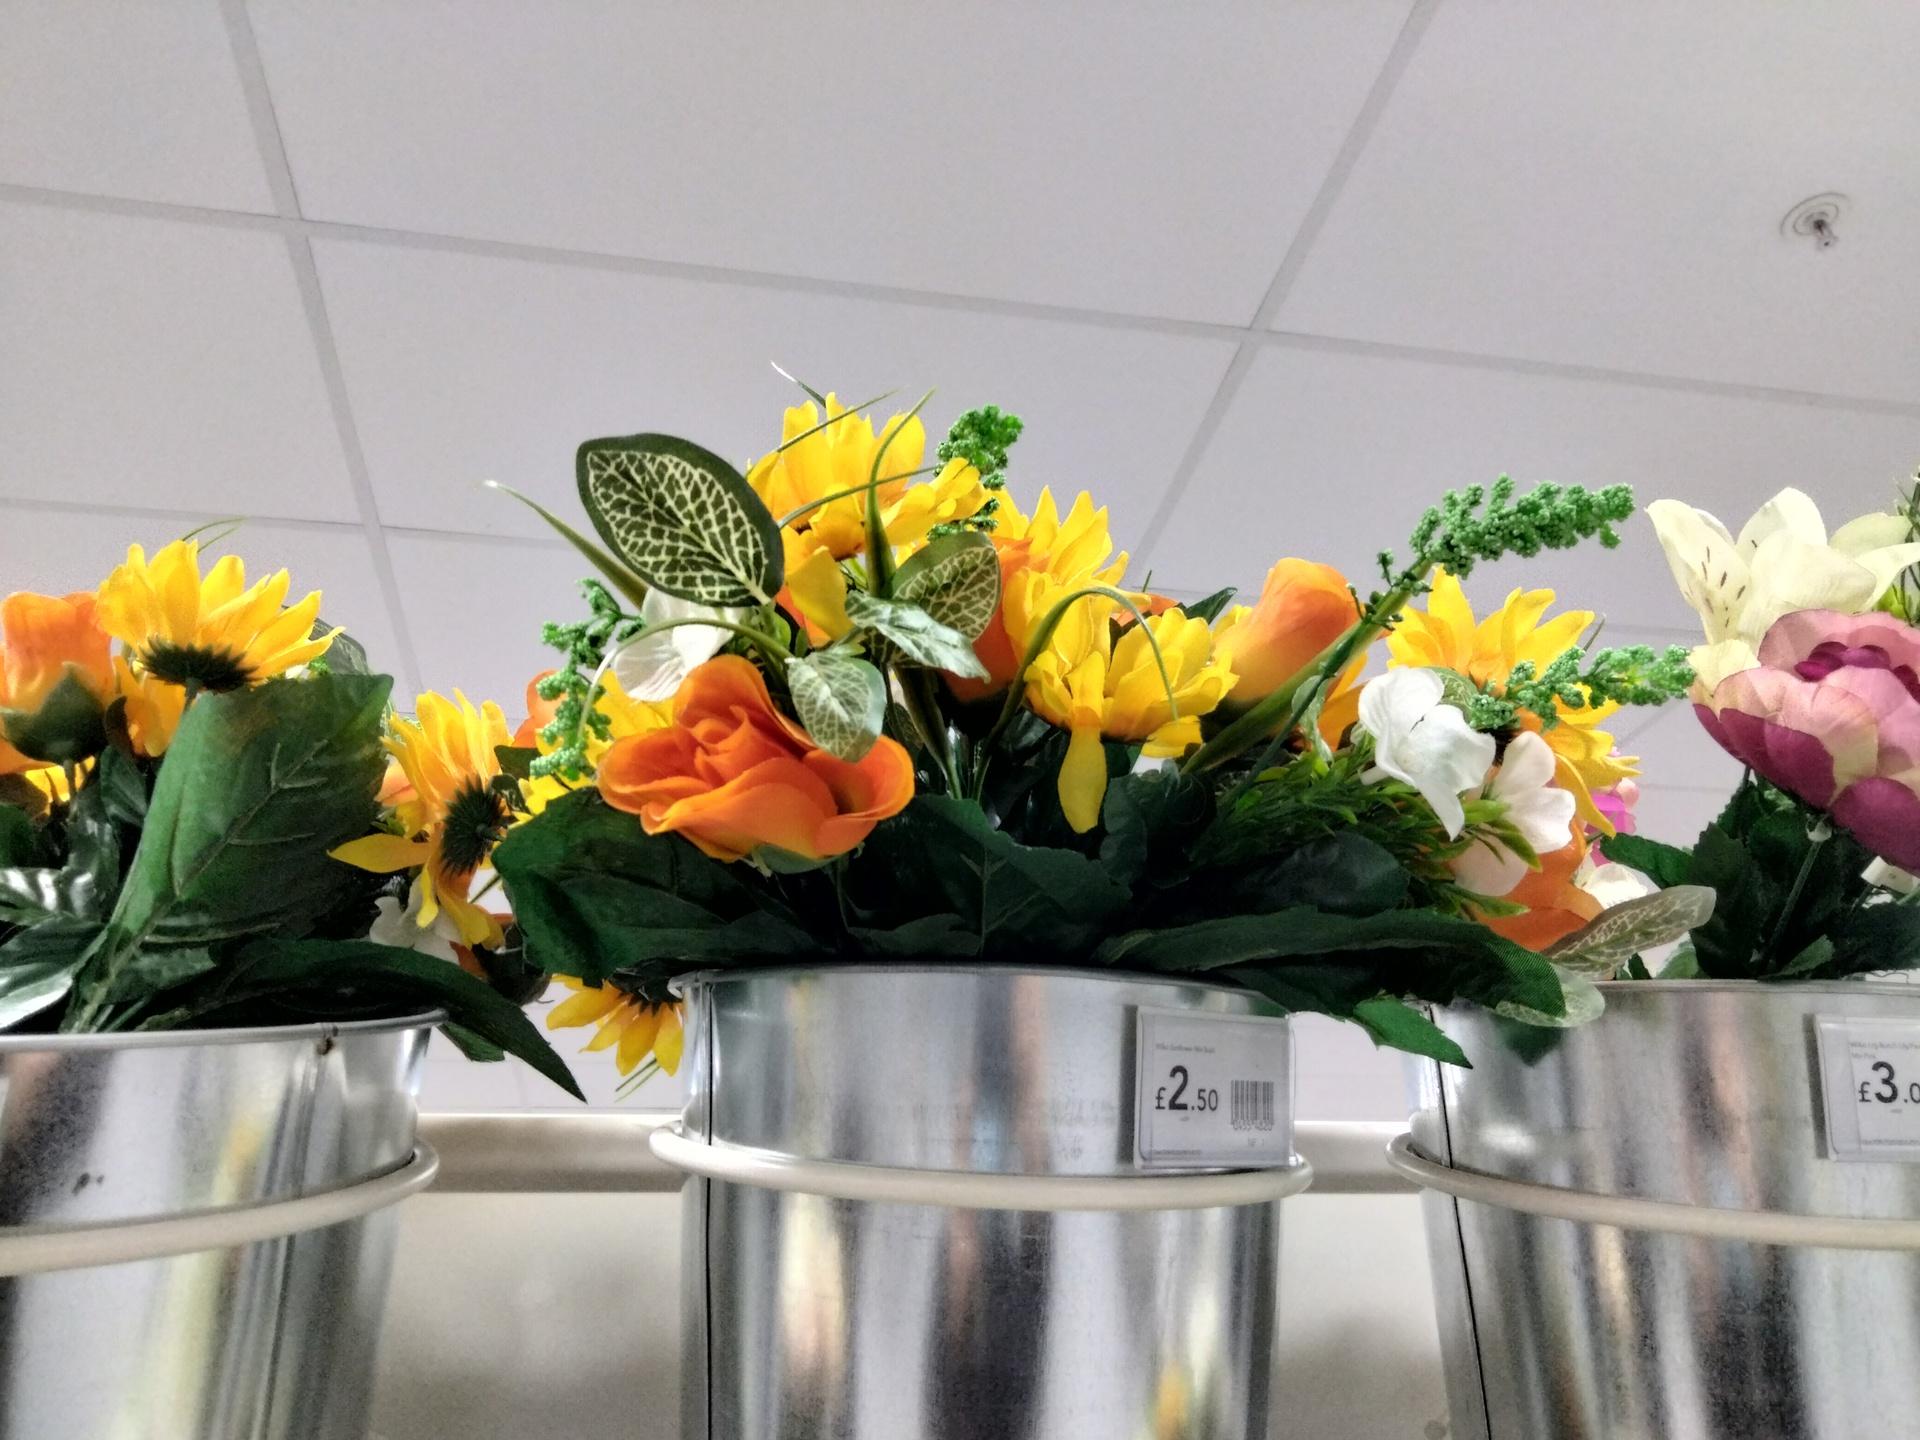 OnePlus Nord N100 photo sample of flowers